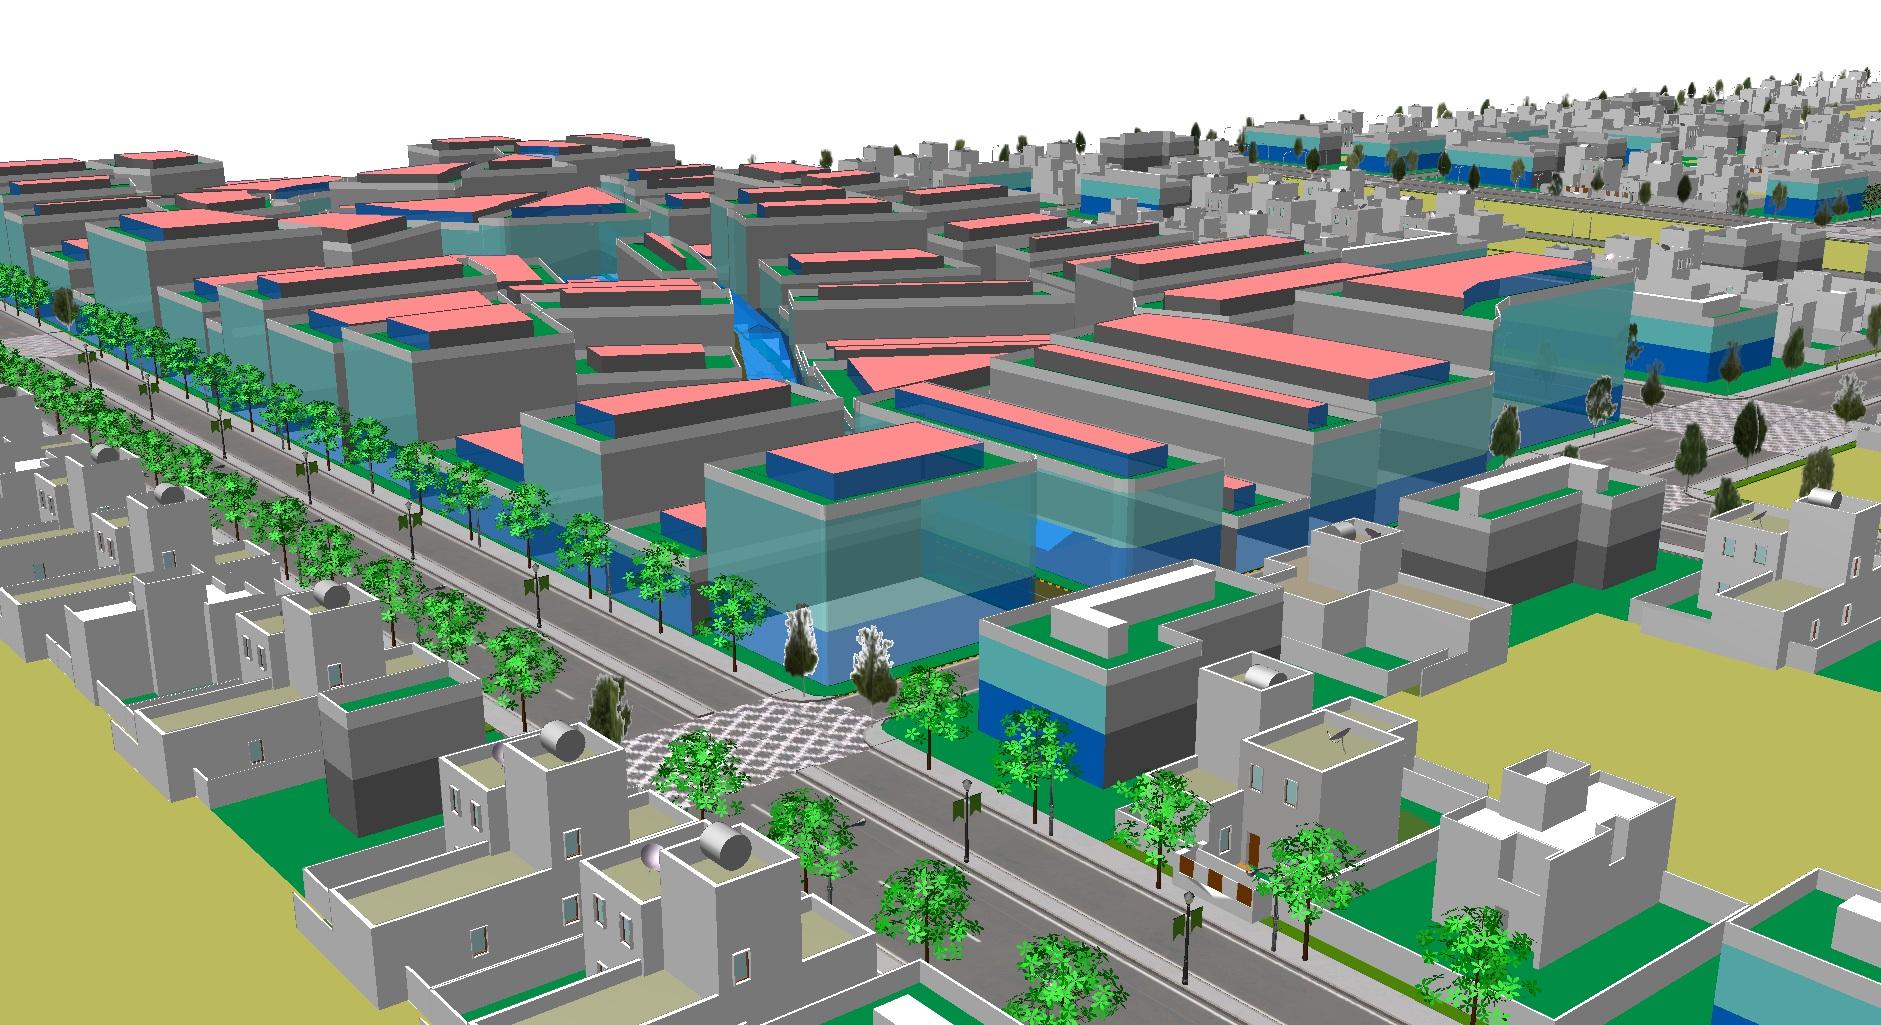 Howgill Planning Ltd : Procedural City Modelling